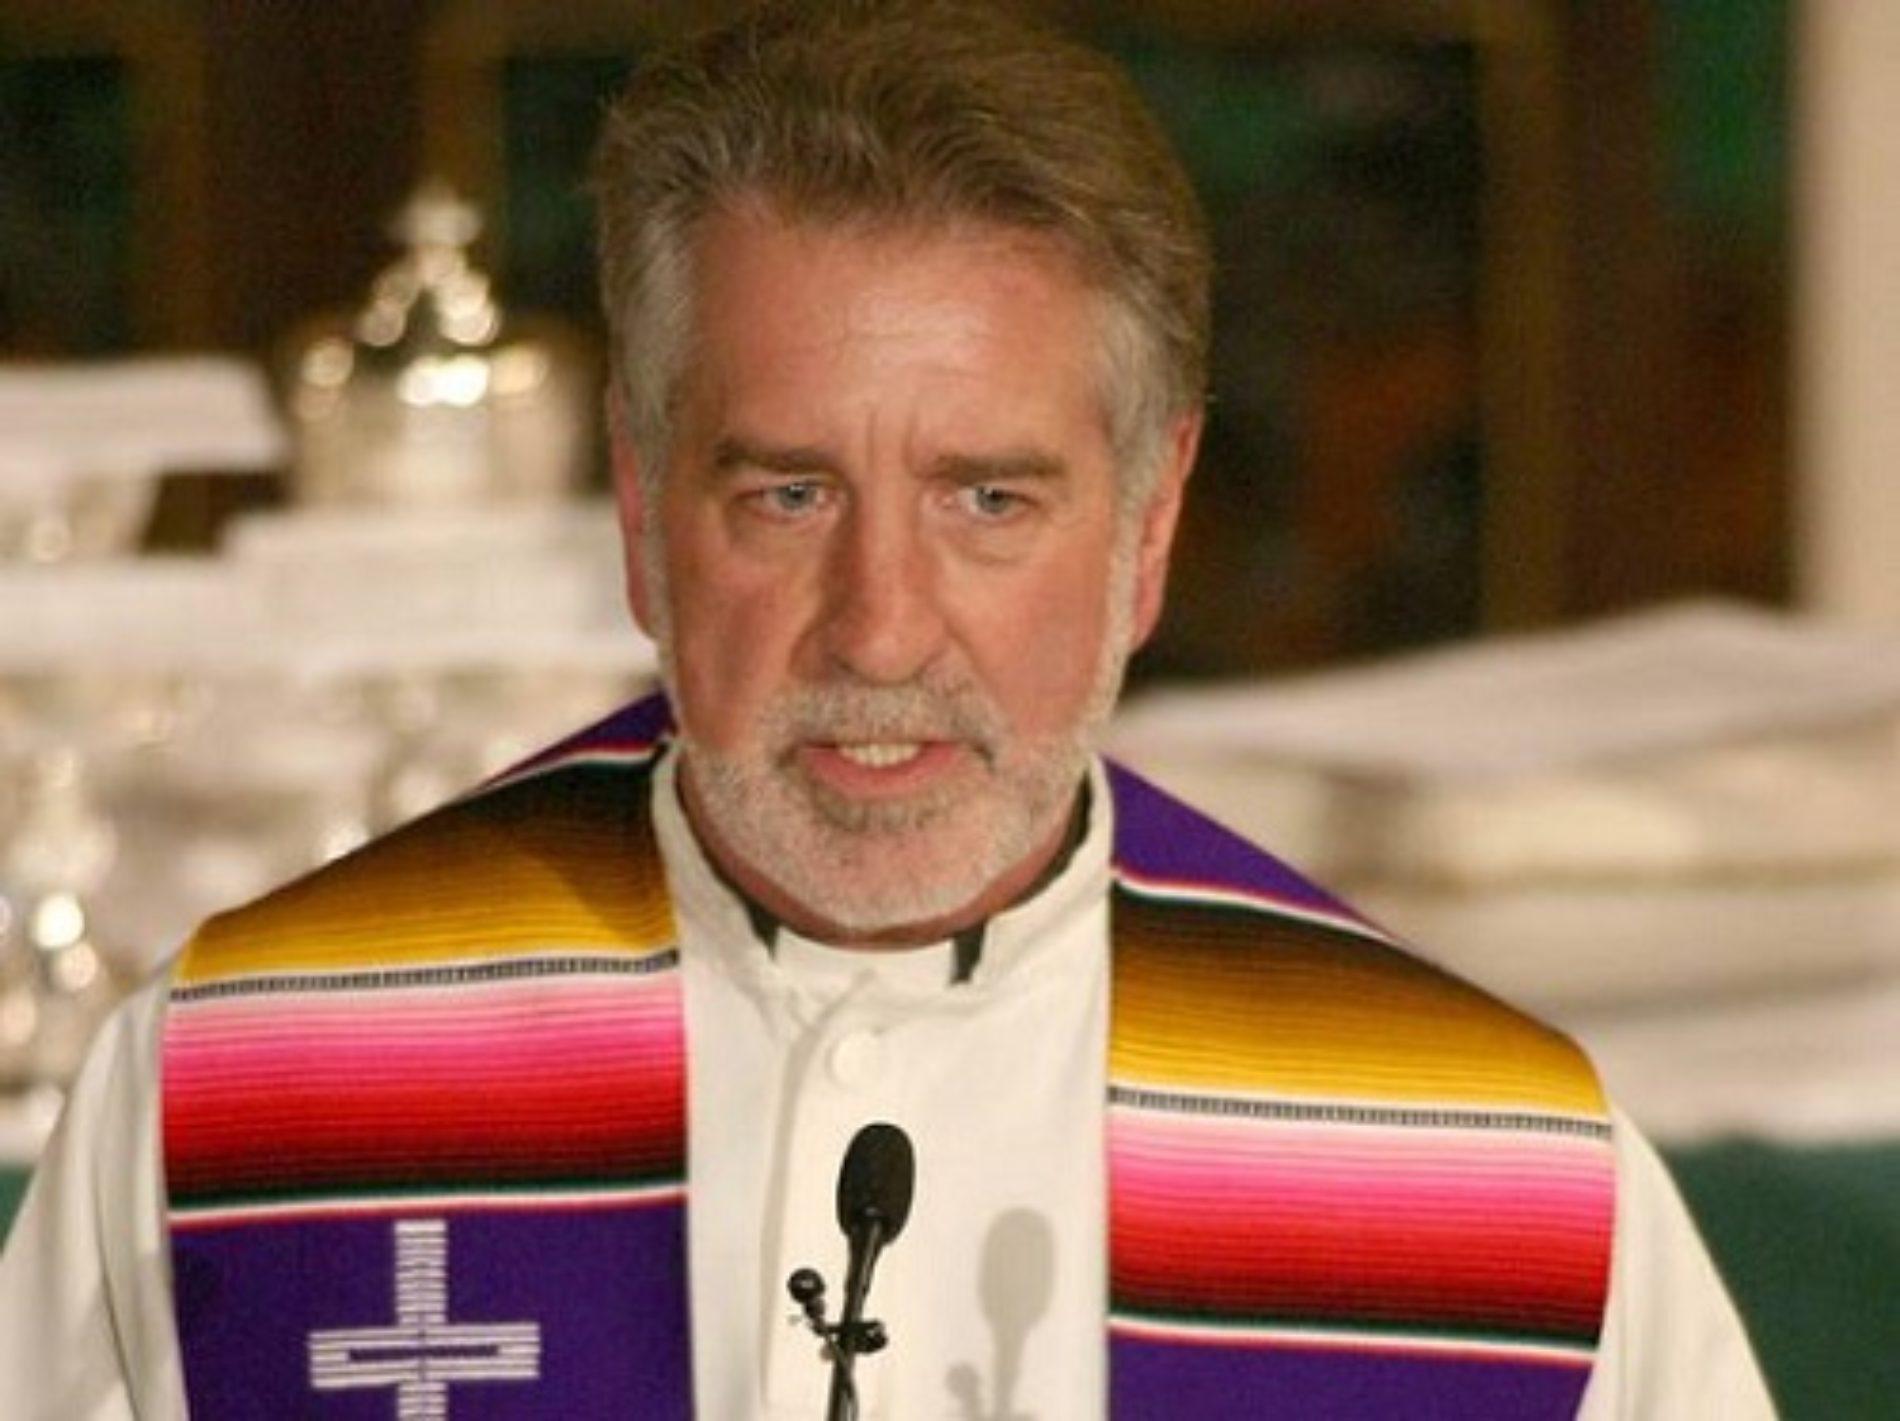 'We Follow a Jesus I Do Not Recognize.' Rev. Colin Coward in a Facebook Rant